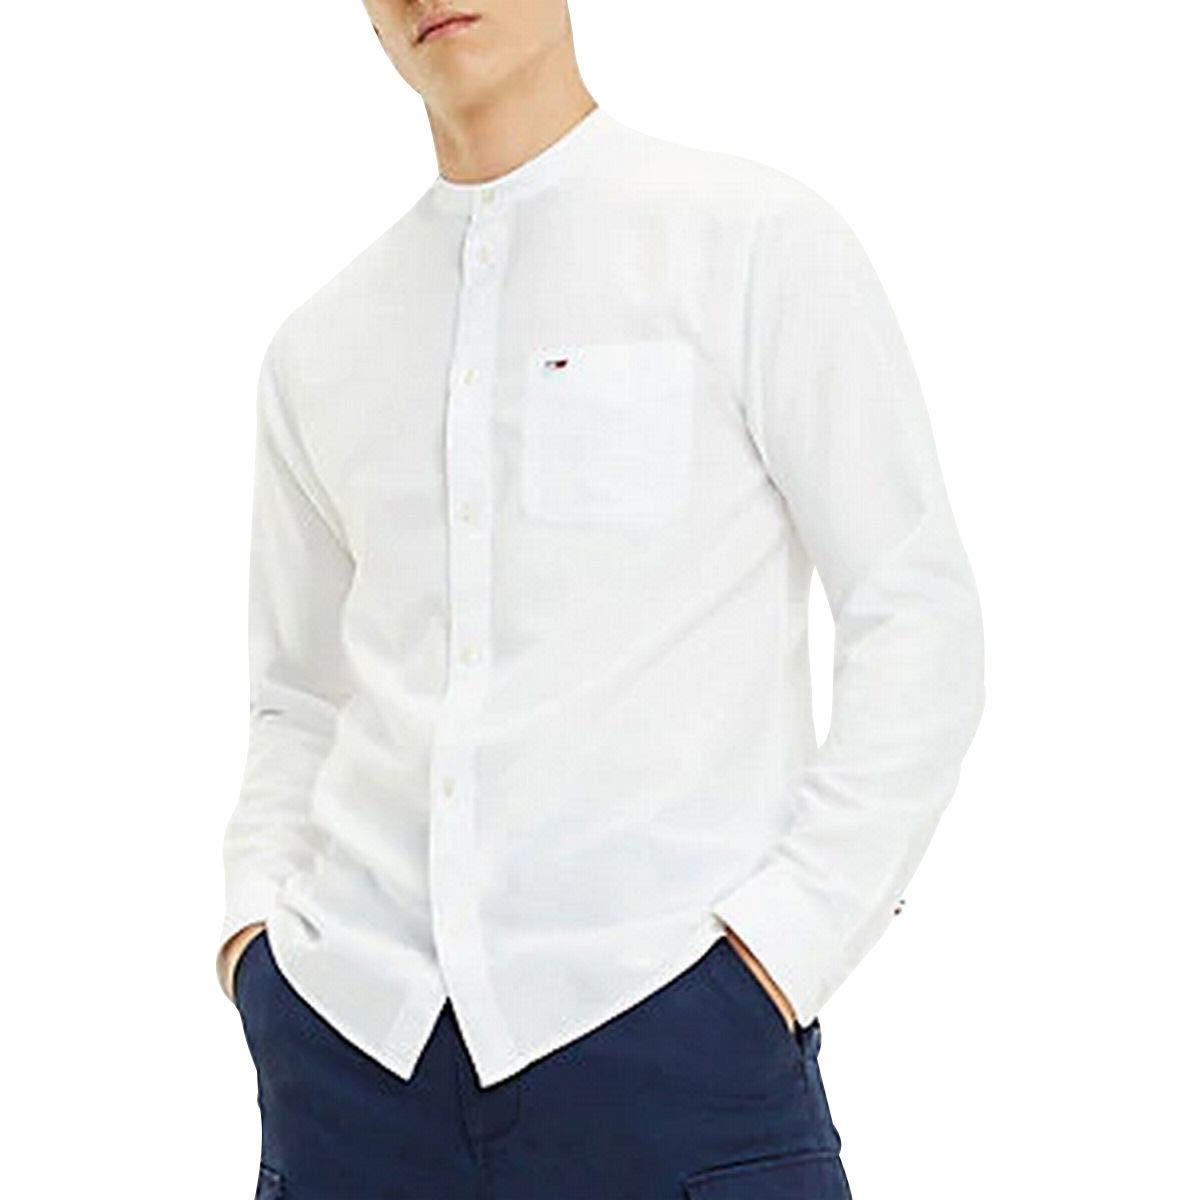 Tommy Hilfiger TJM Mao Linen Shirt Chemise Casual Homme